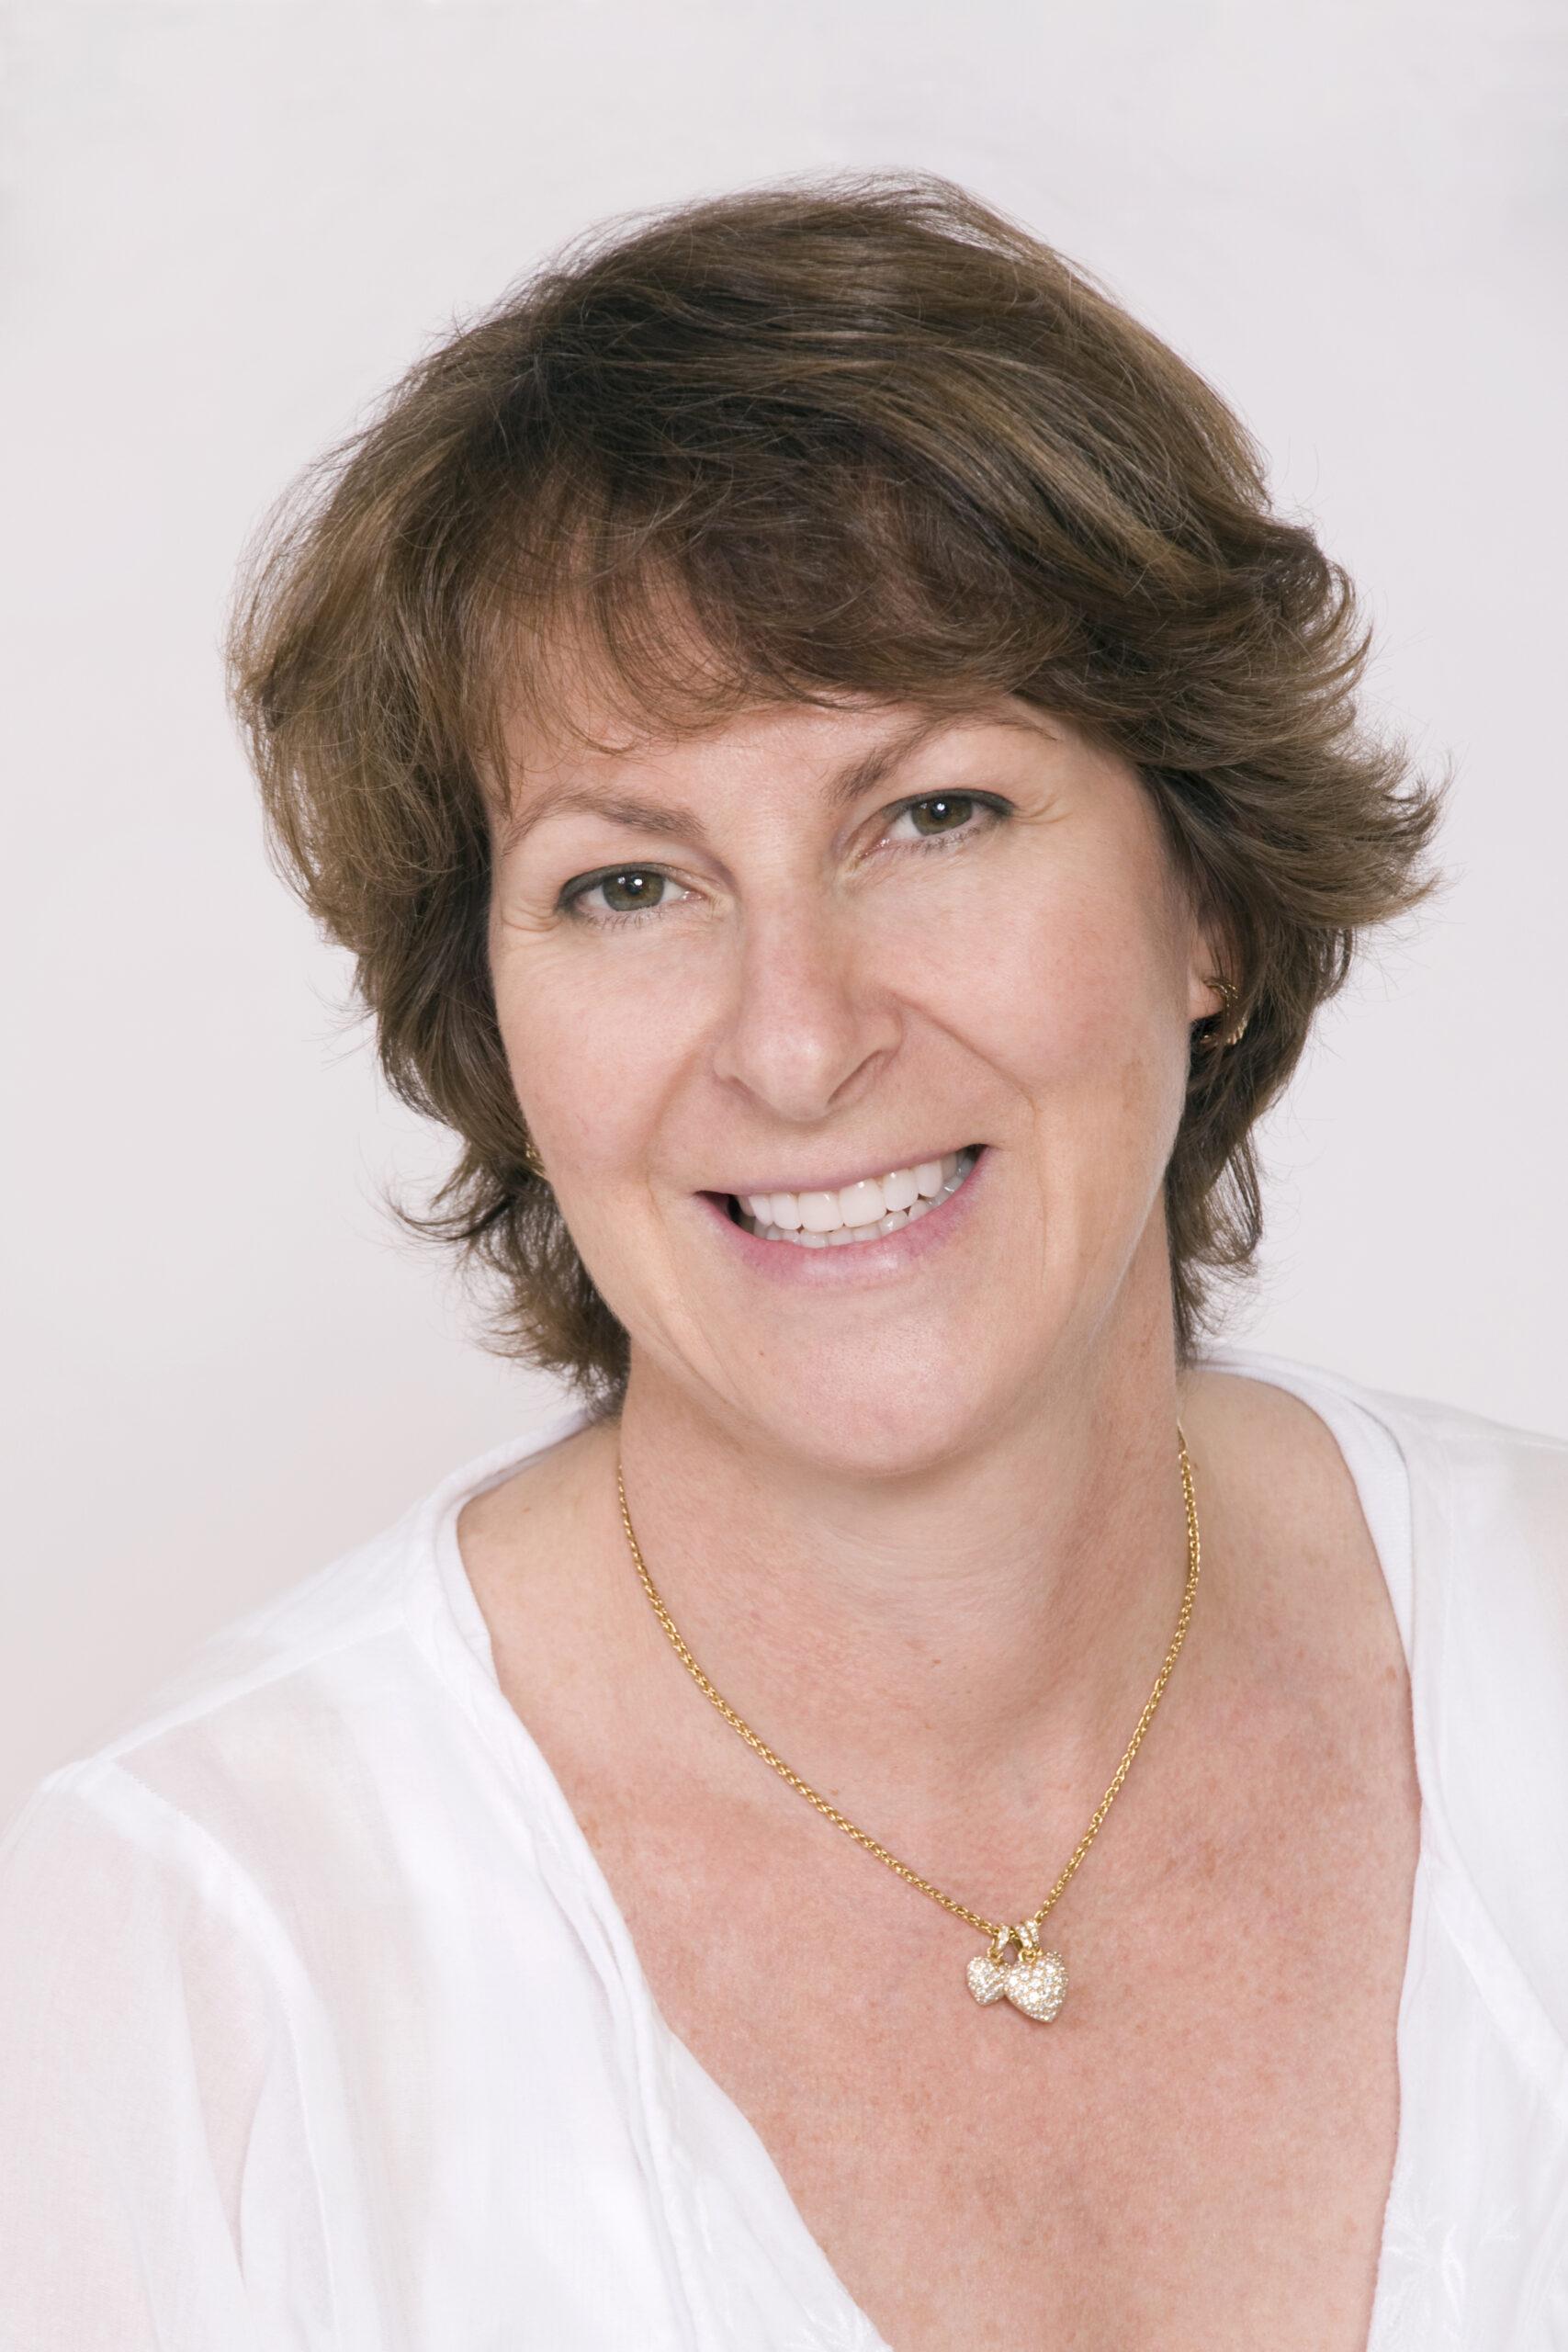 Headshot of Mary Menell Zients